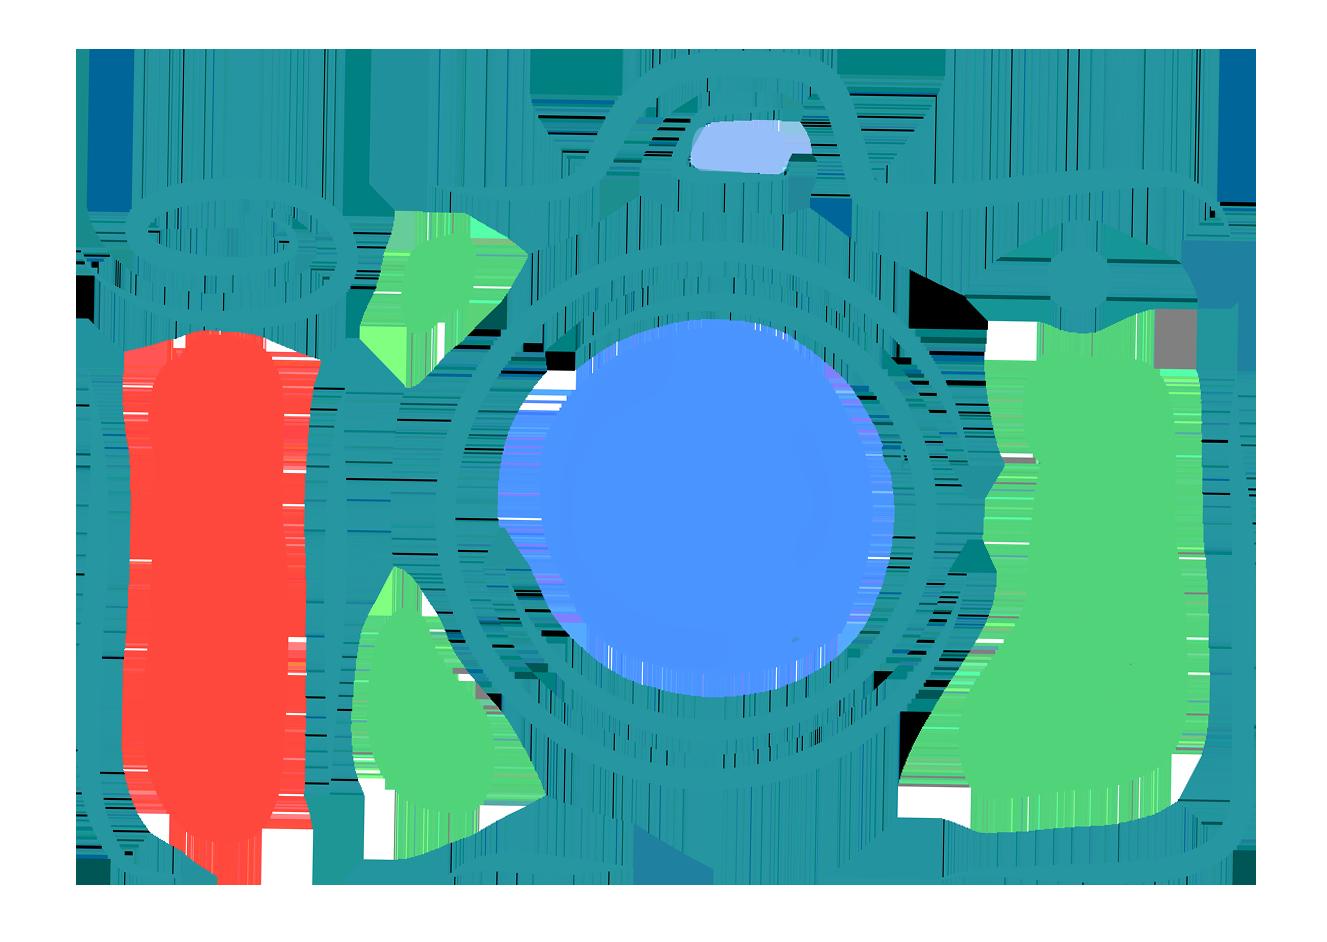 Photograph clipart color camera. Jools harvey photography